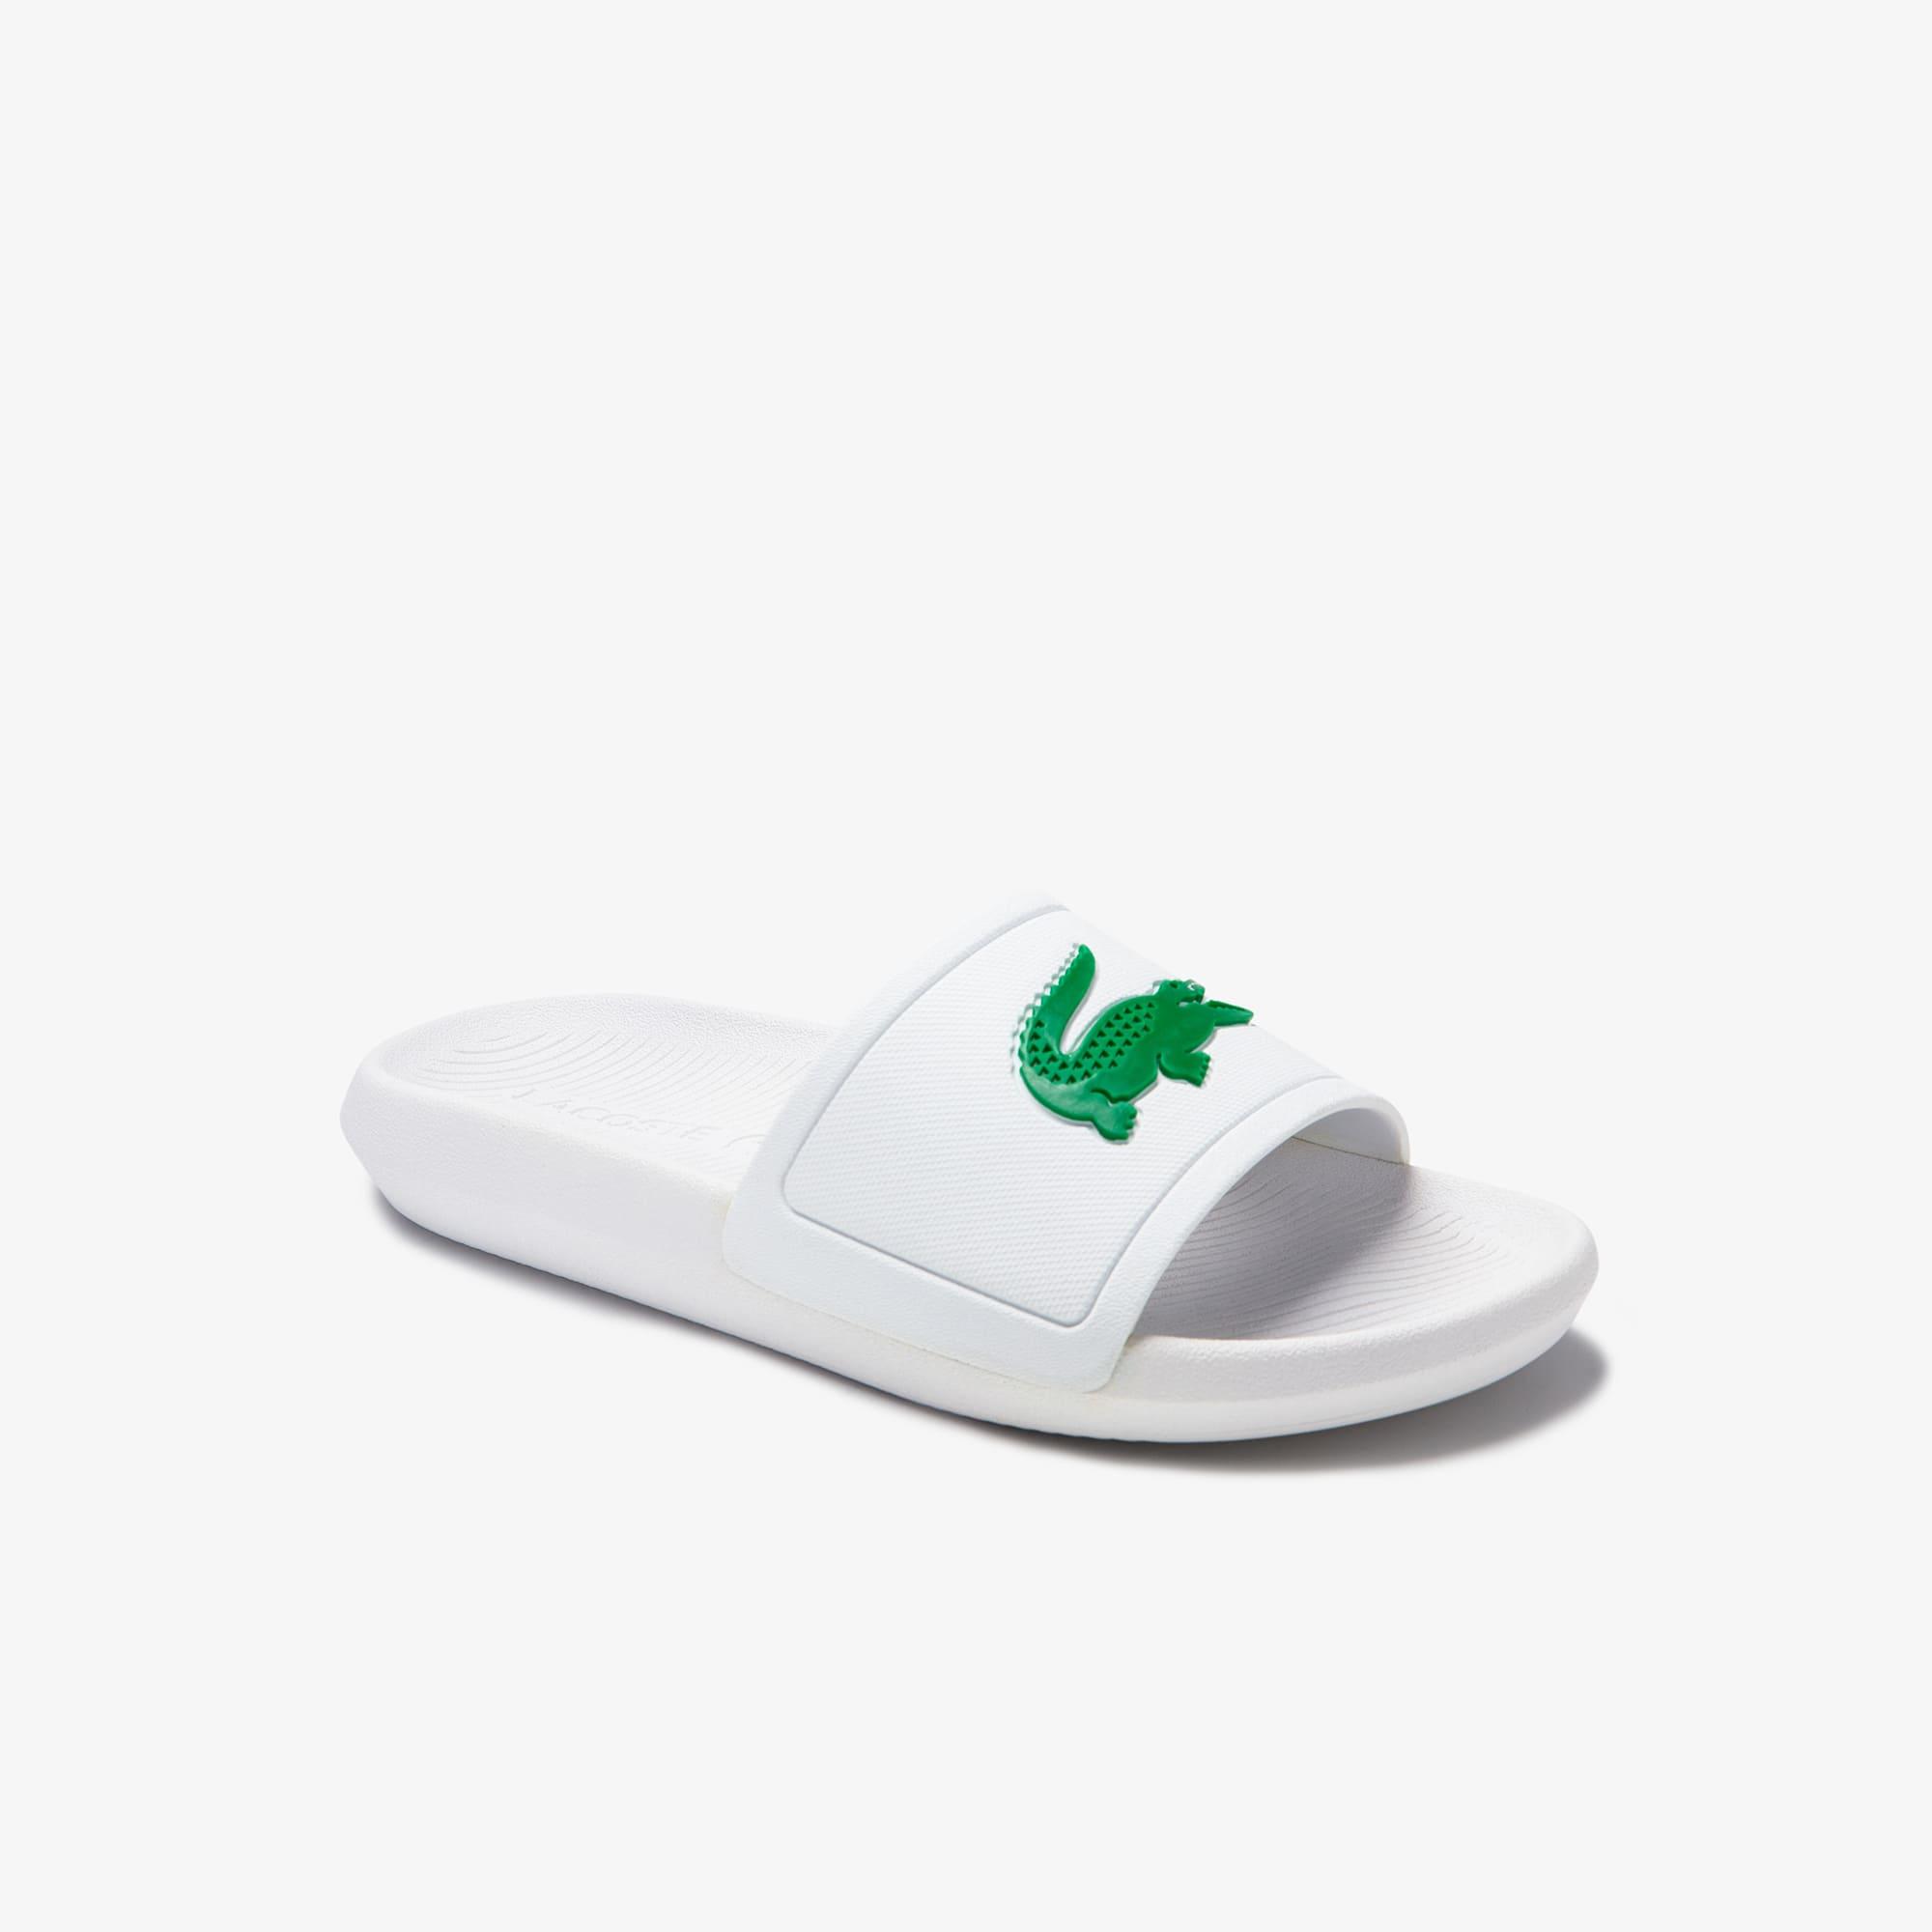 b2325f4bfd Shoes for Women | Footwear | LACOSTE